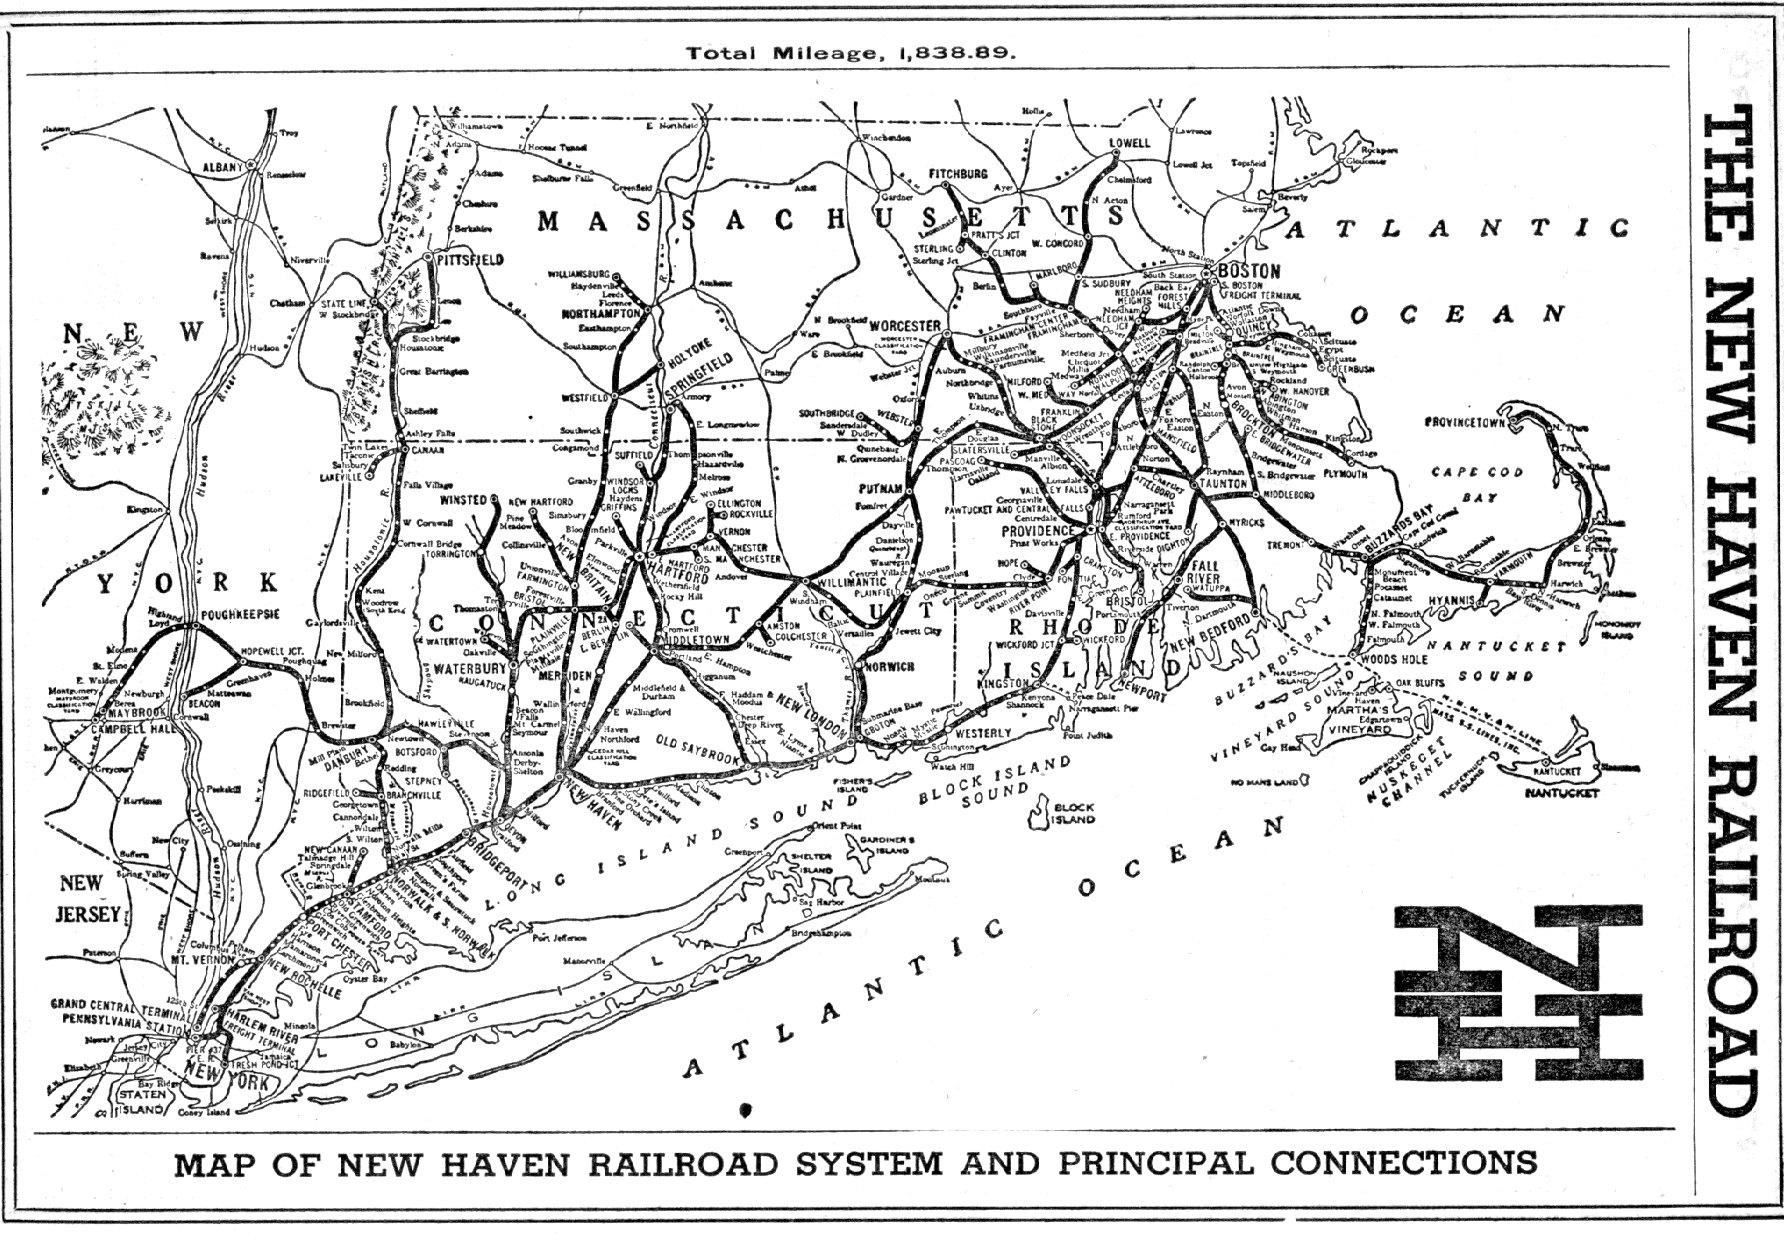 Fantasy Map Passenger Rail System For Connecticut Connecticut